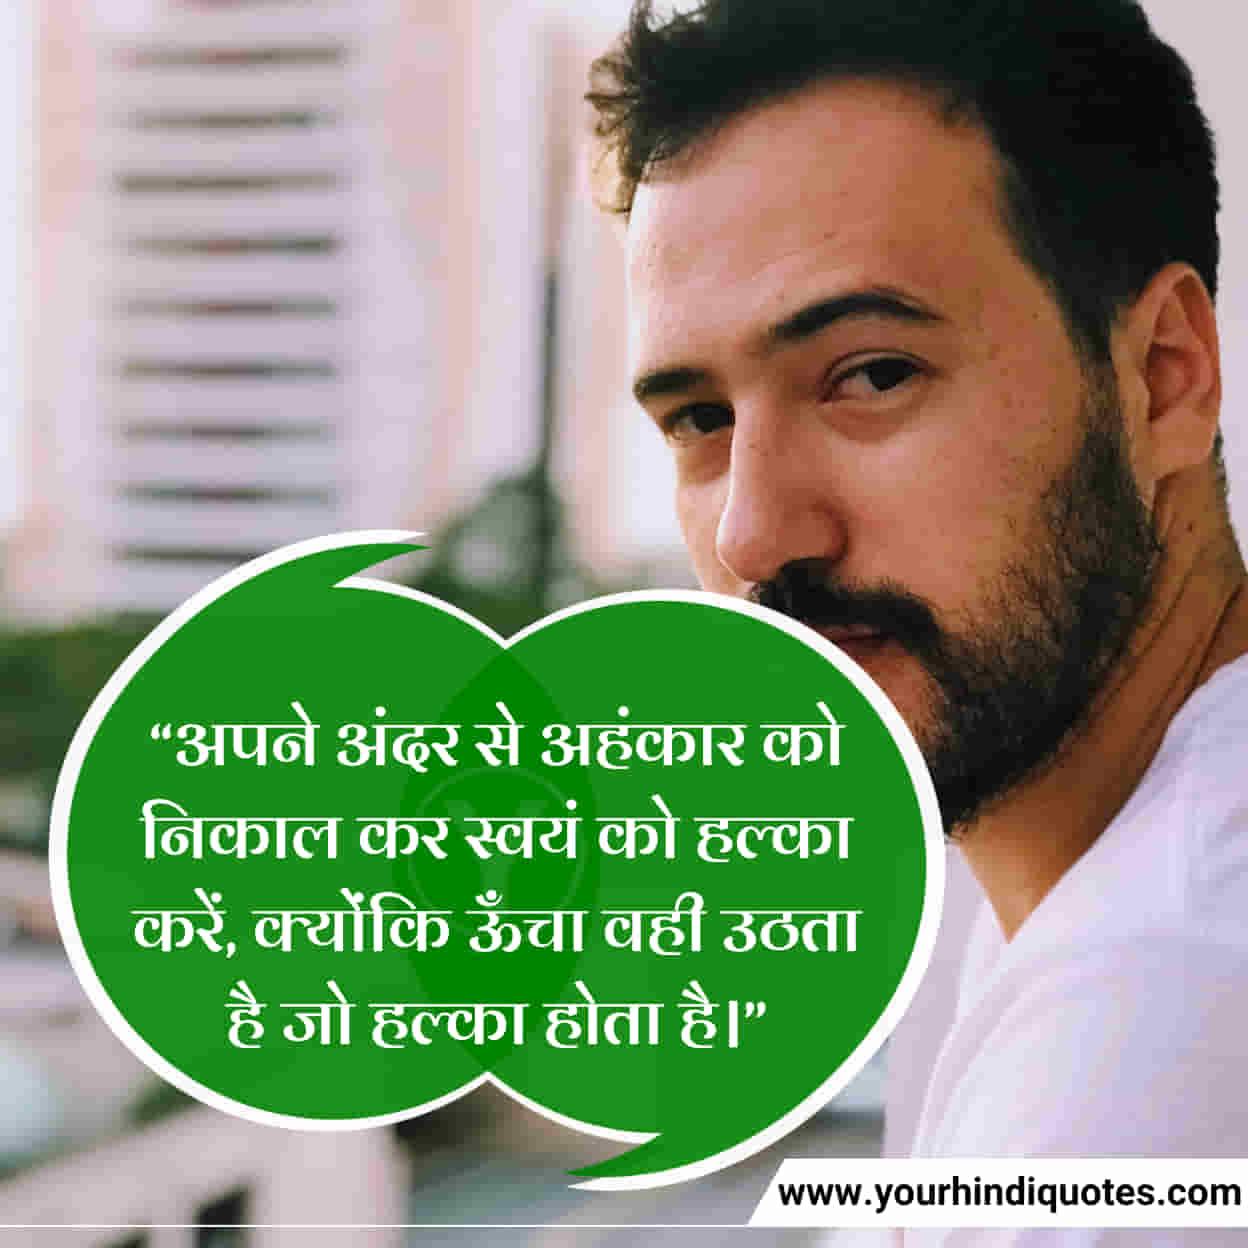 Motivational Hindi Shayari Status